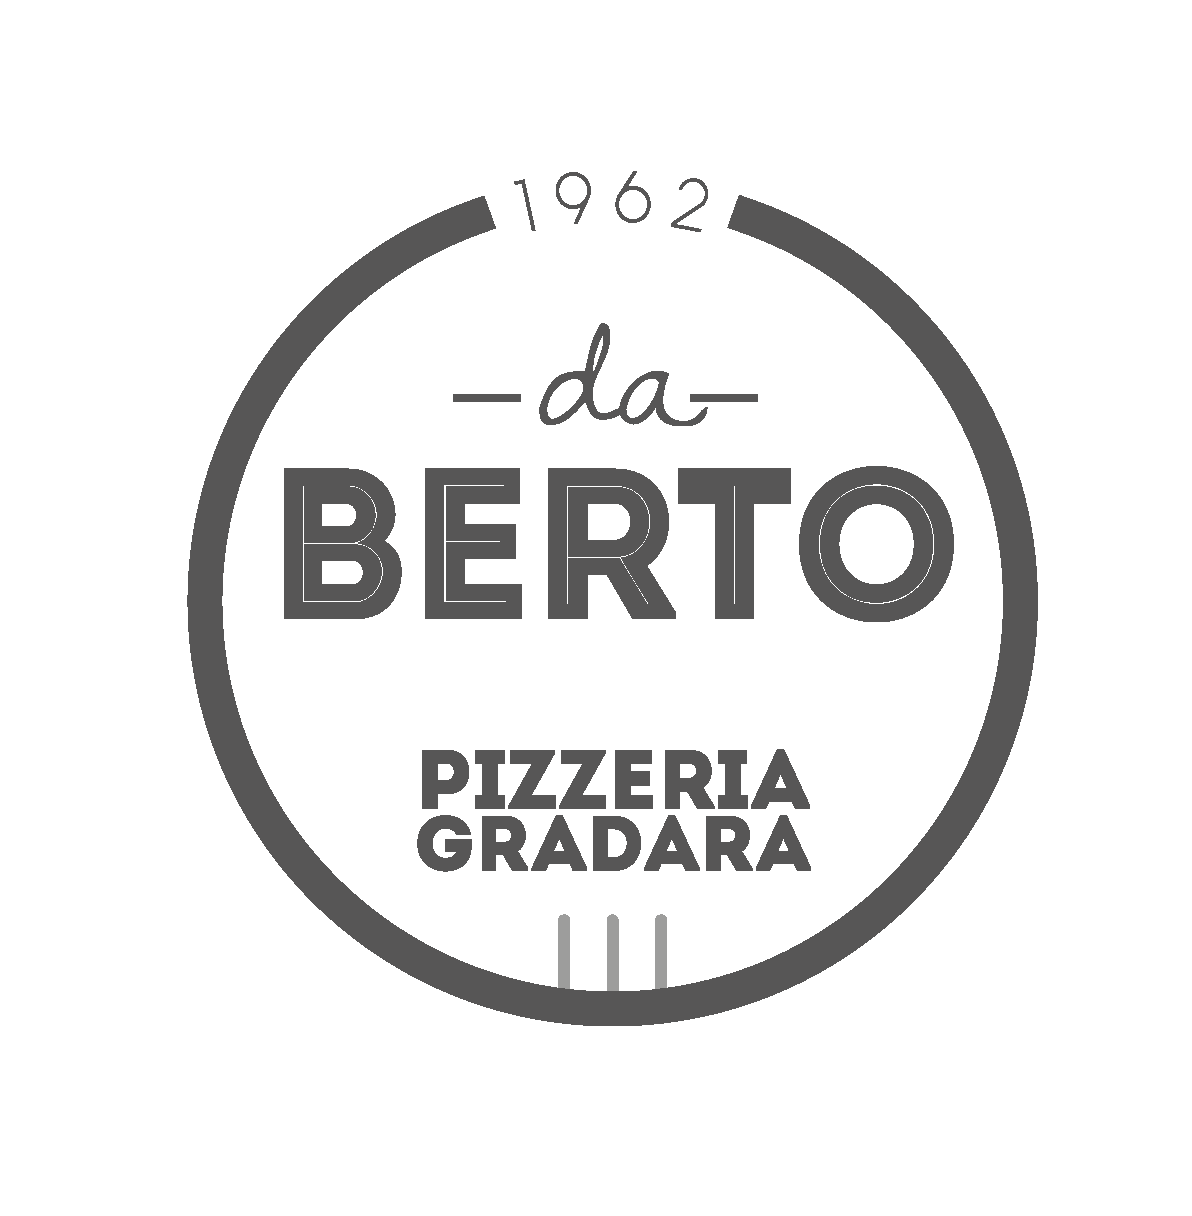 Pizzeria Da Berto Gradara